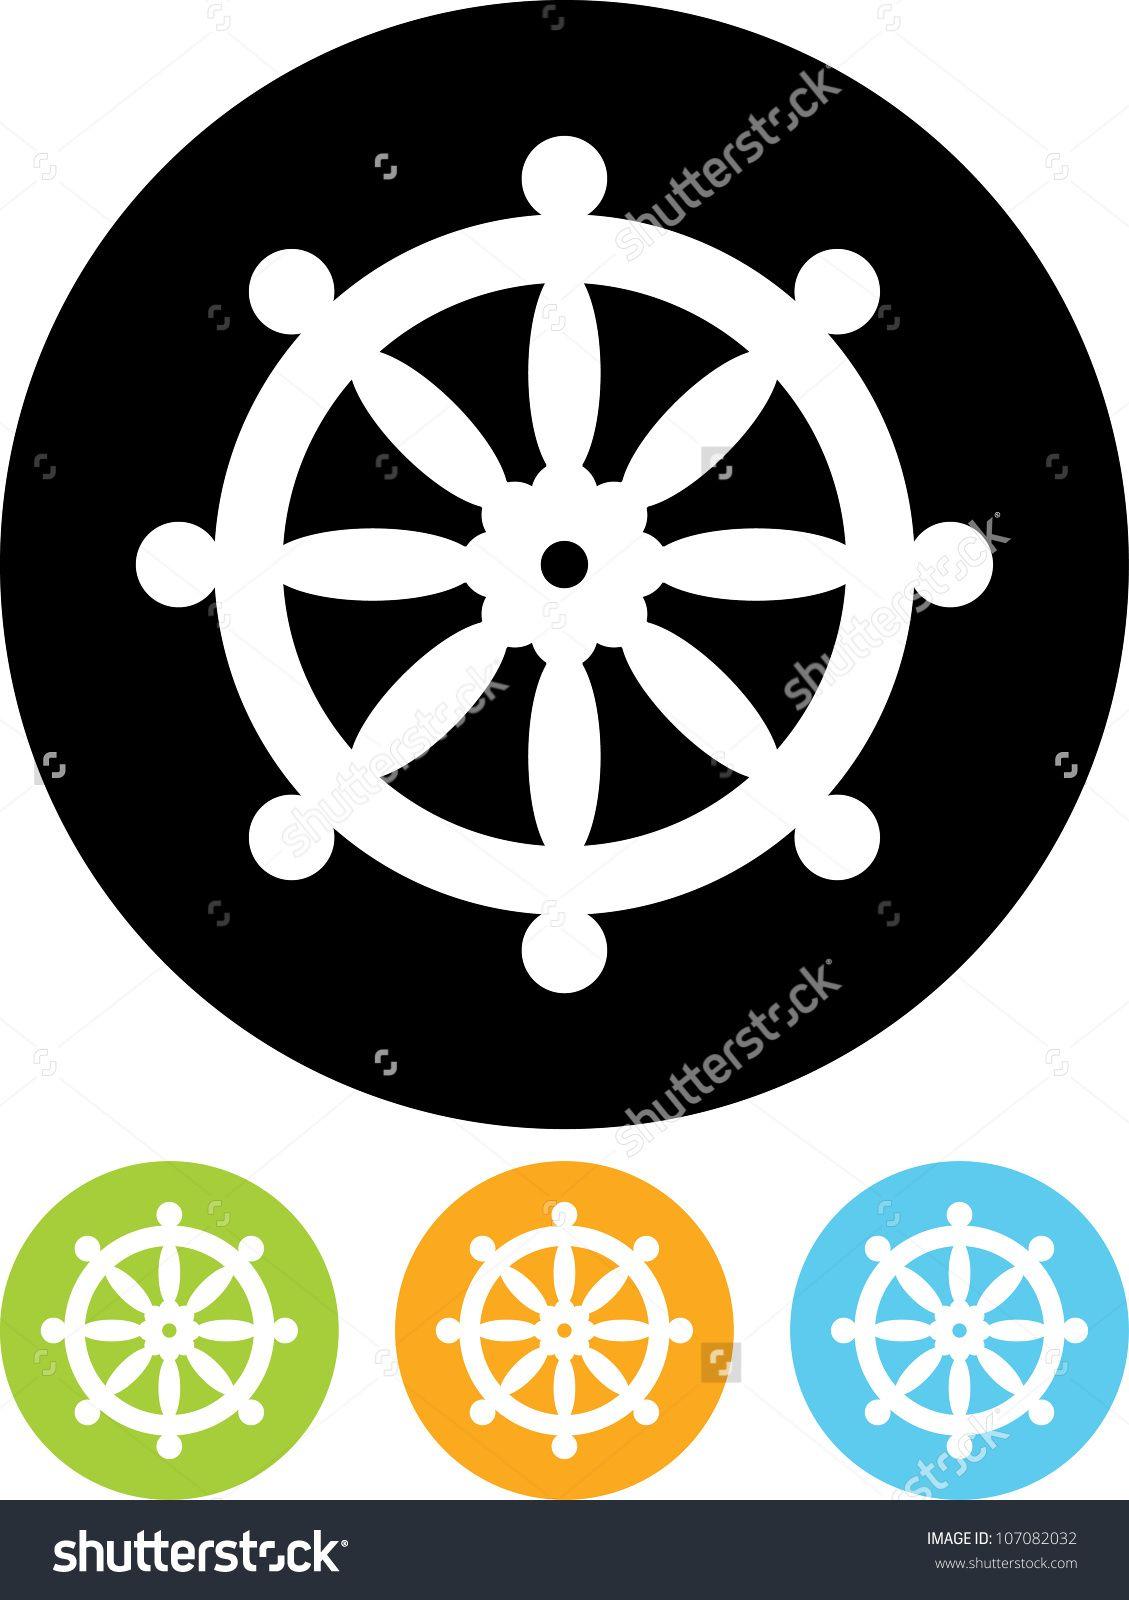 Stock vector buddhist wheel symbol vector icon isolated 107082032 illustration of dharma wheel buddha buddhism religion symbol vector art clipart and stock vectors buycottarizona Image collections